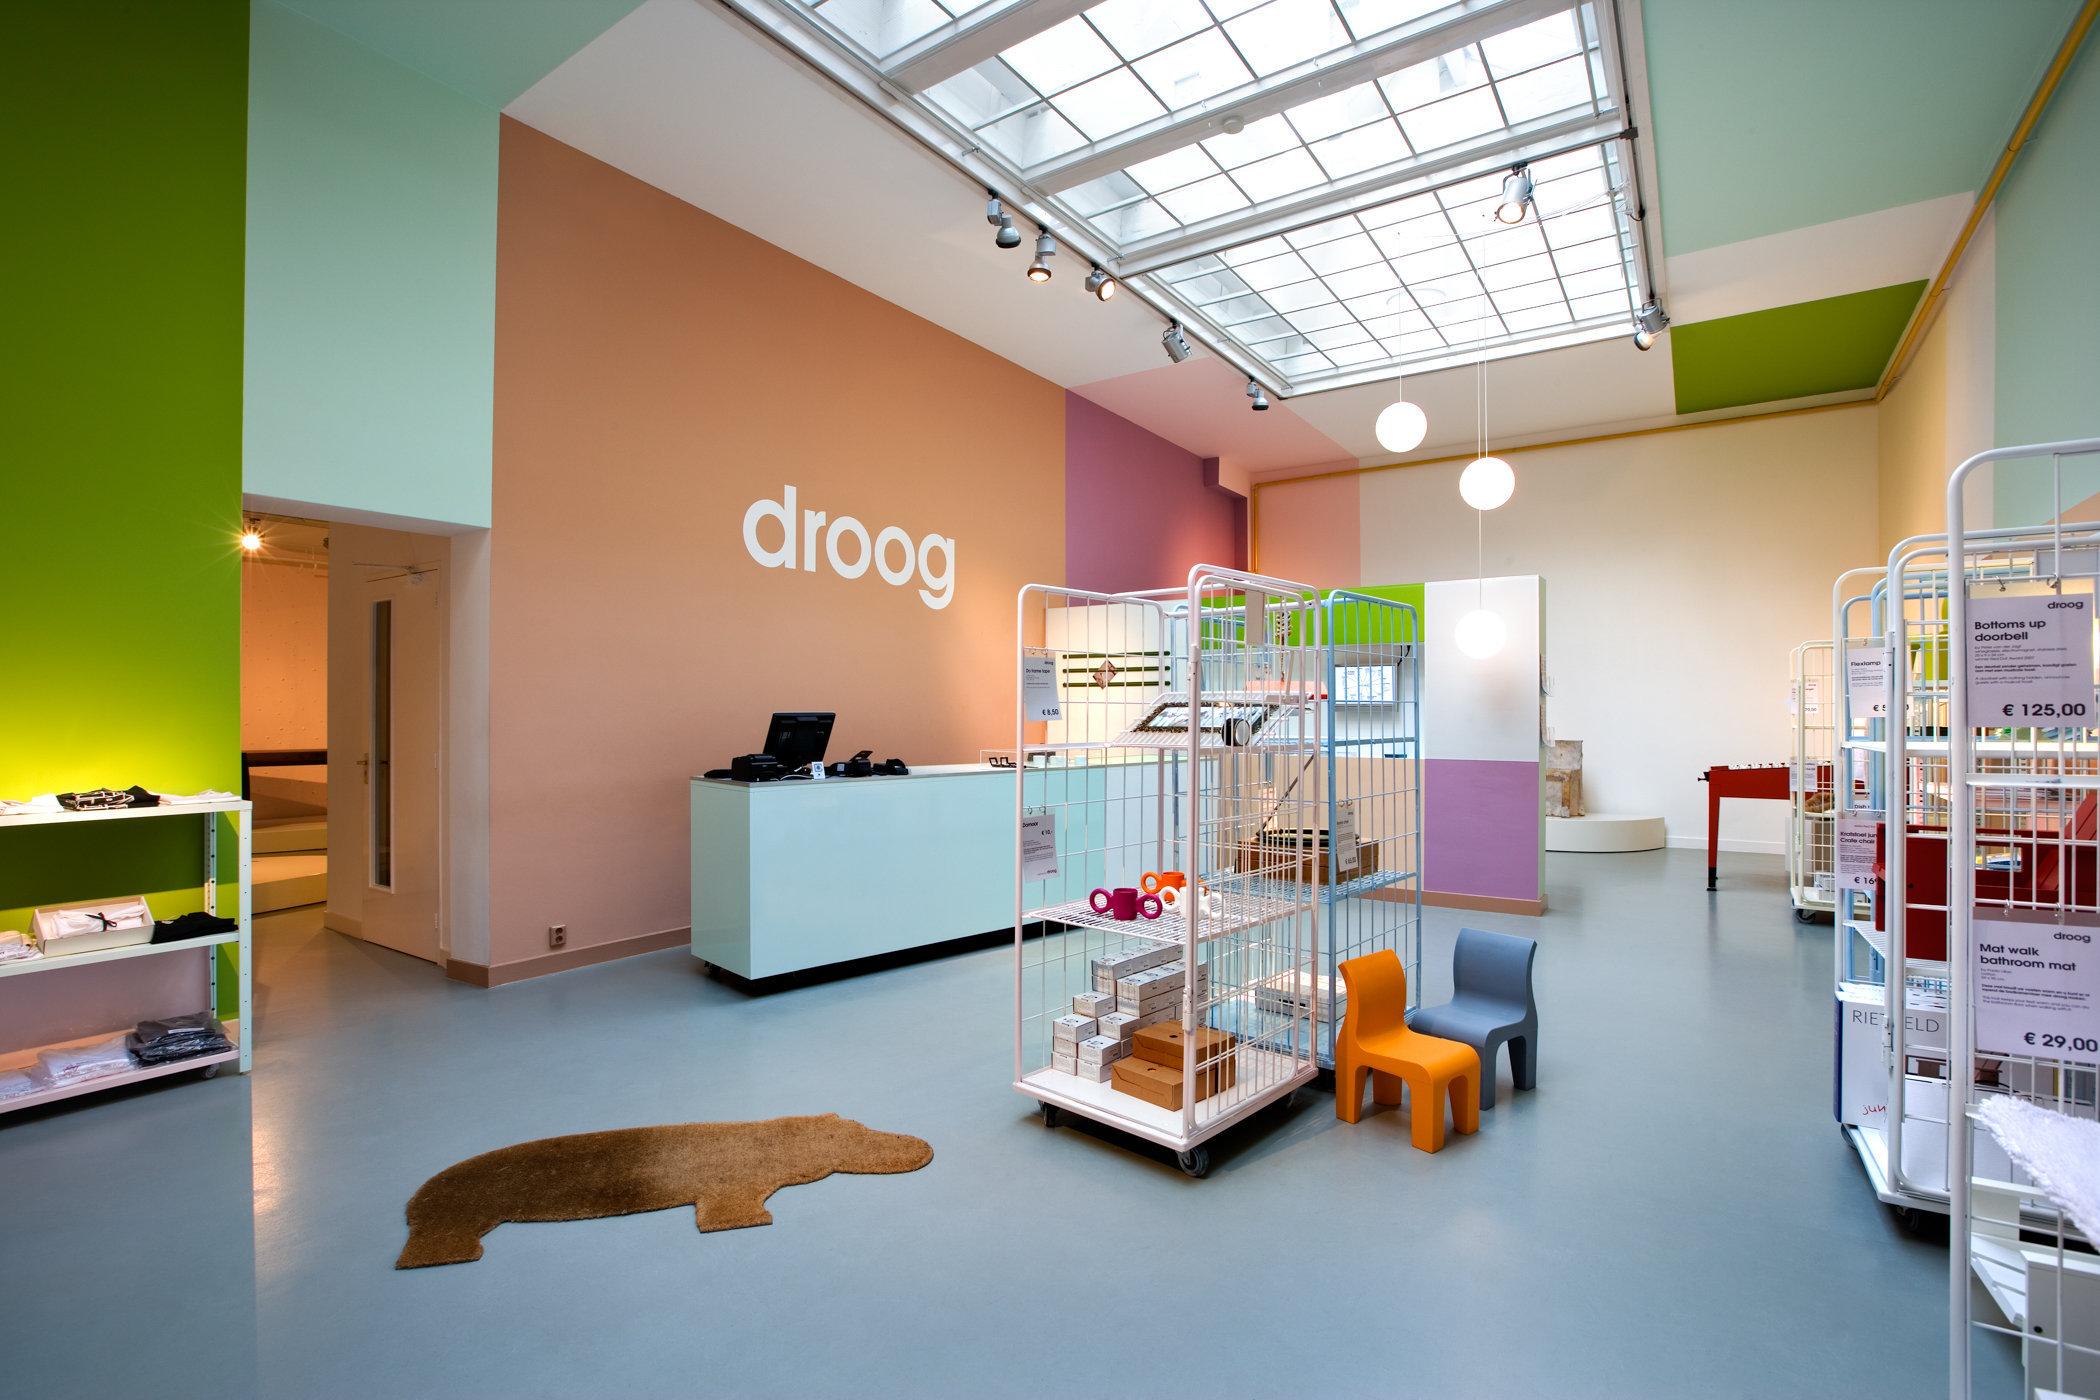 Droog Design store, Amsterdam